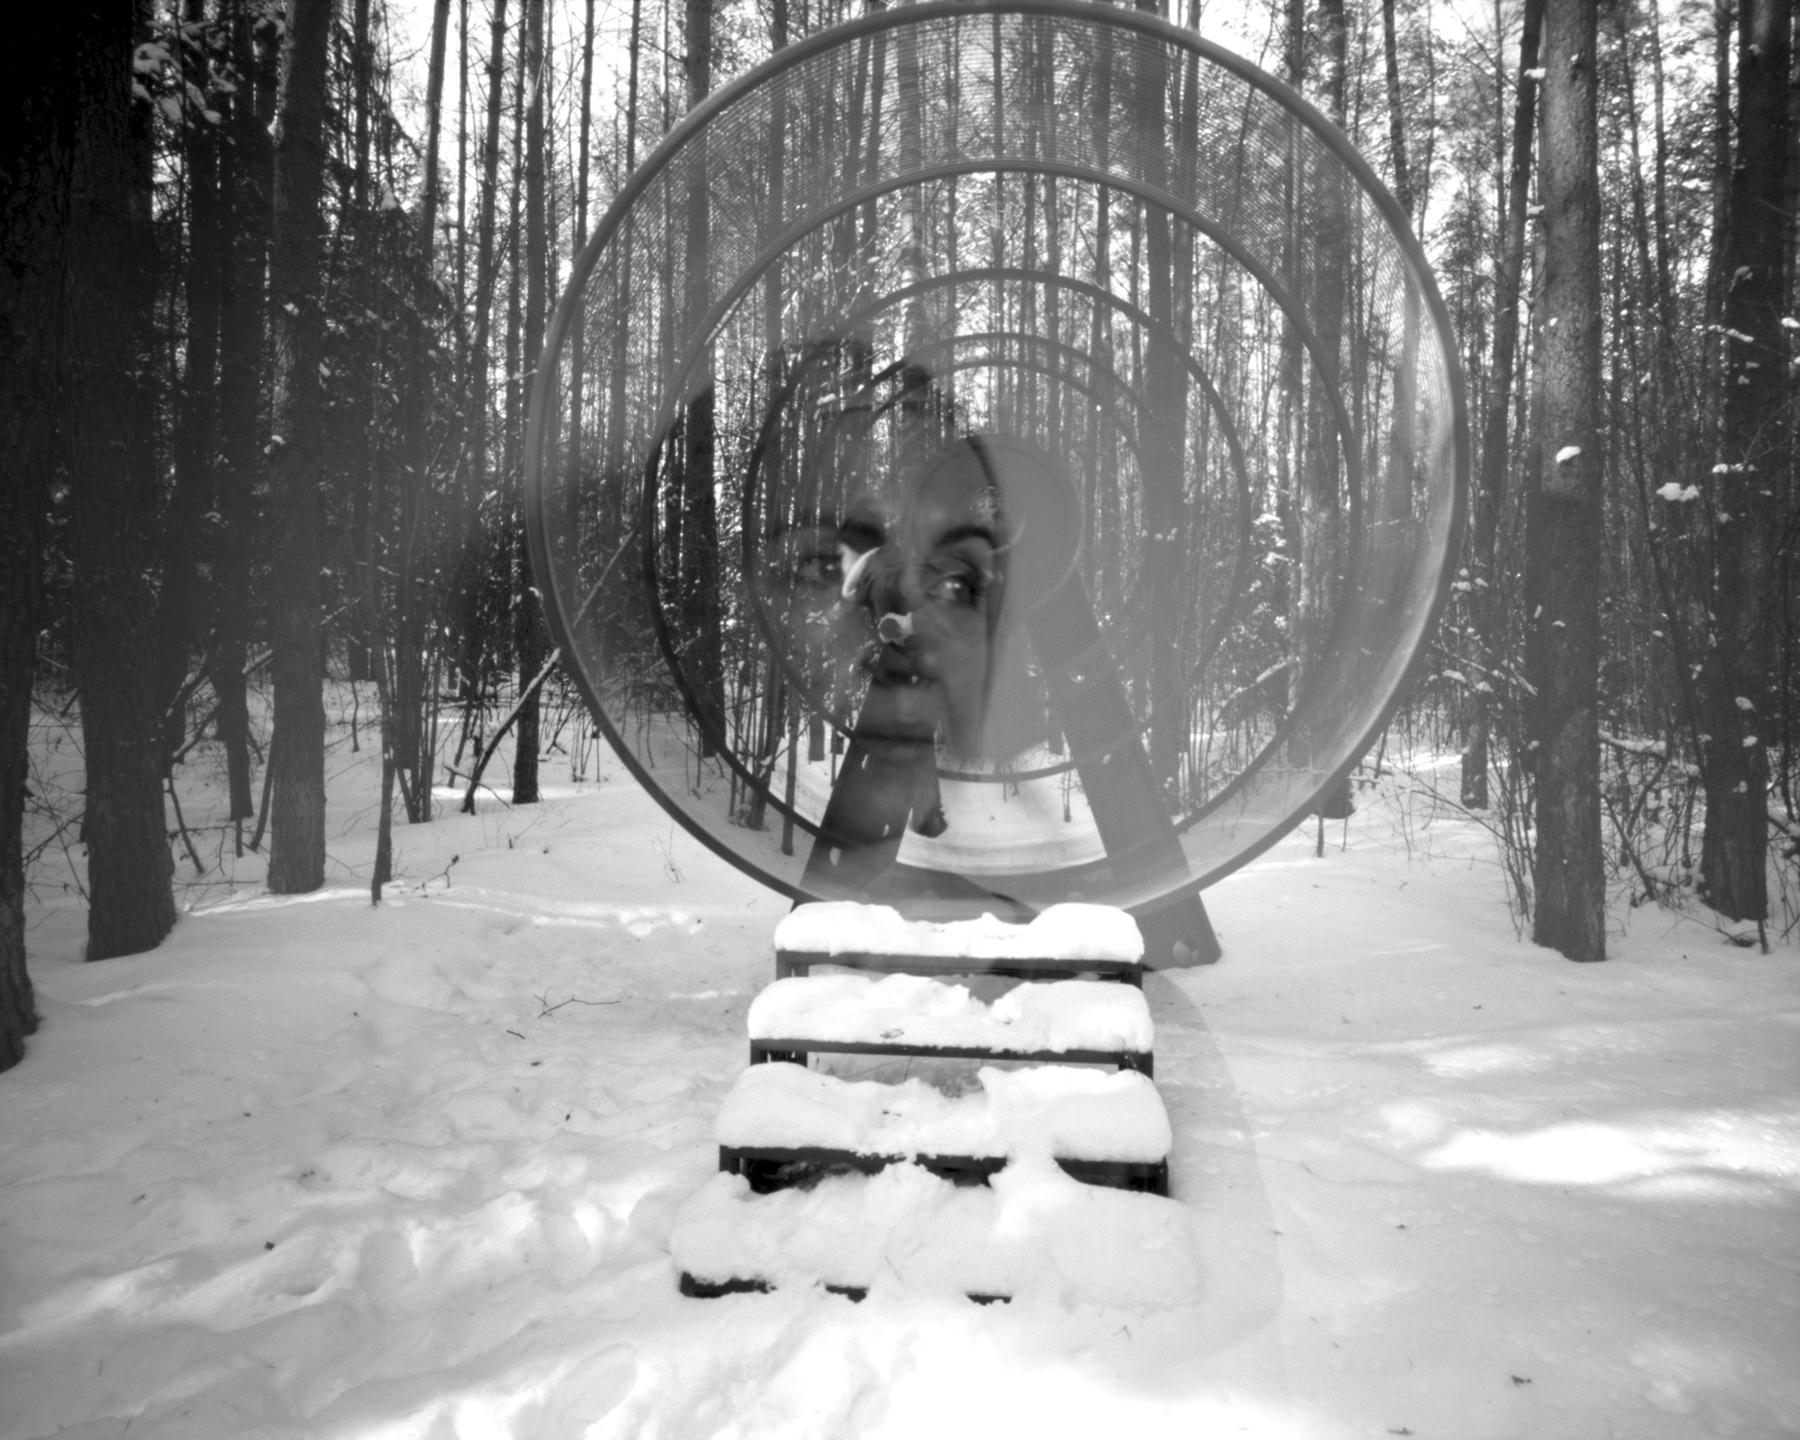 Rima_Virbauskaite_Who am I_I am like a squirrel in the wheel_2.jpg